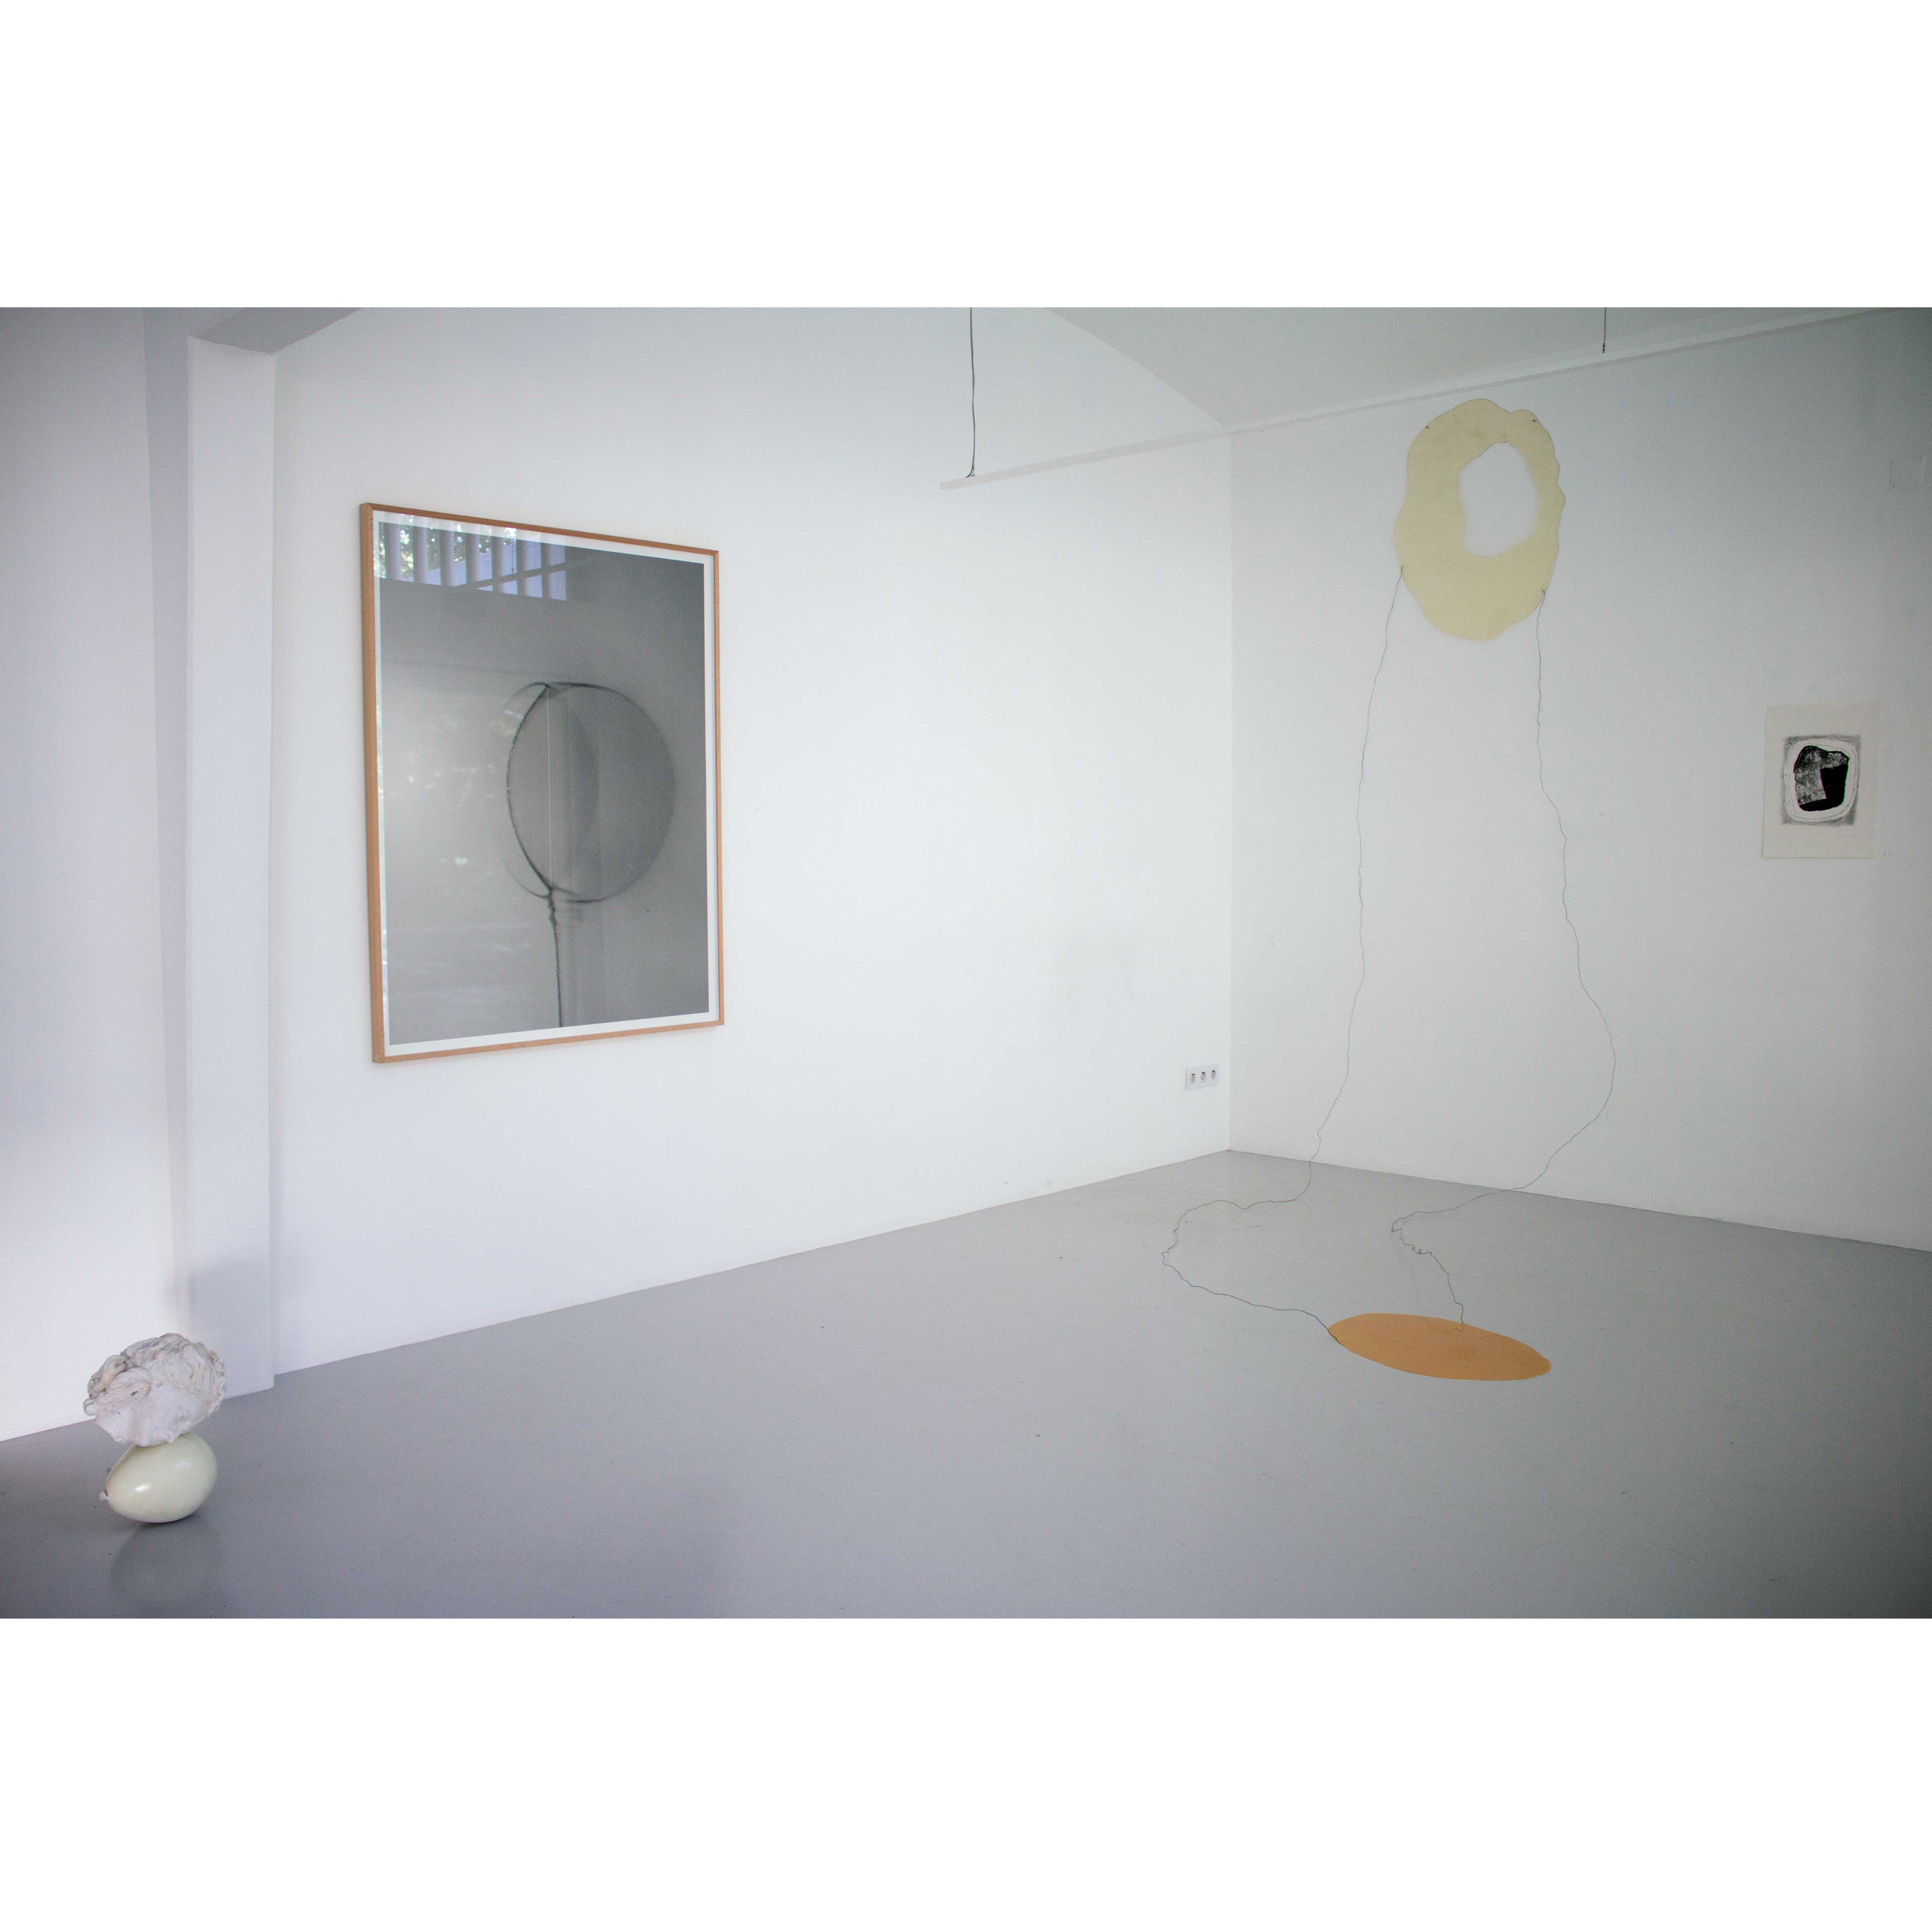 Exhibition Views. Studies on the Pos